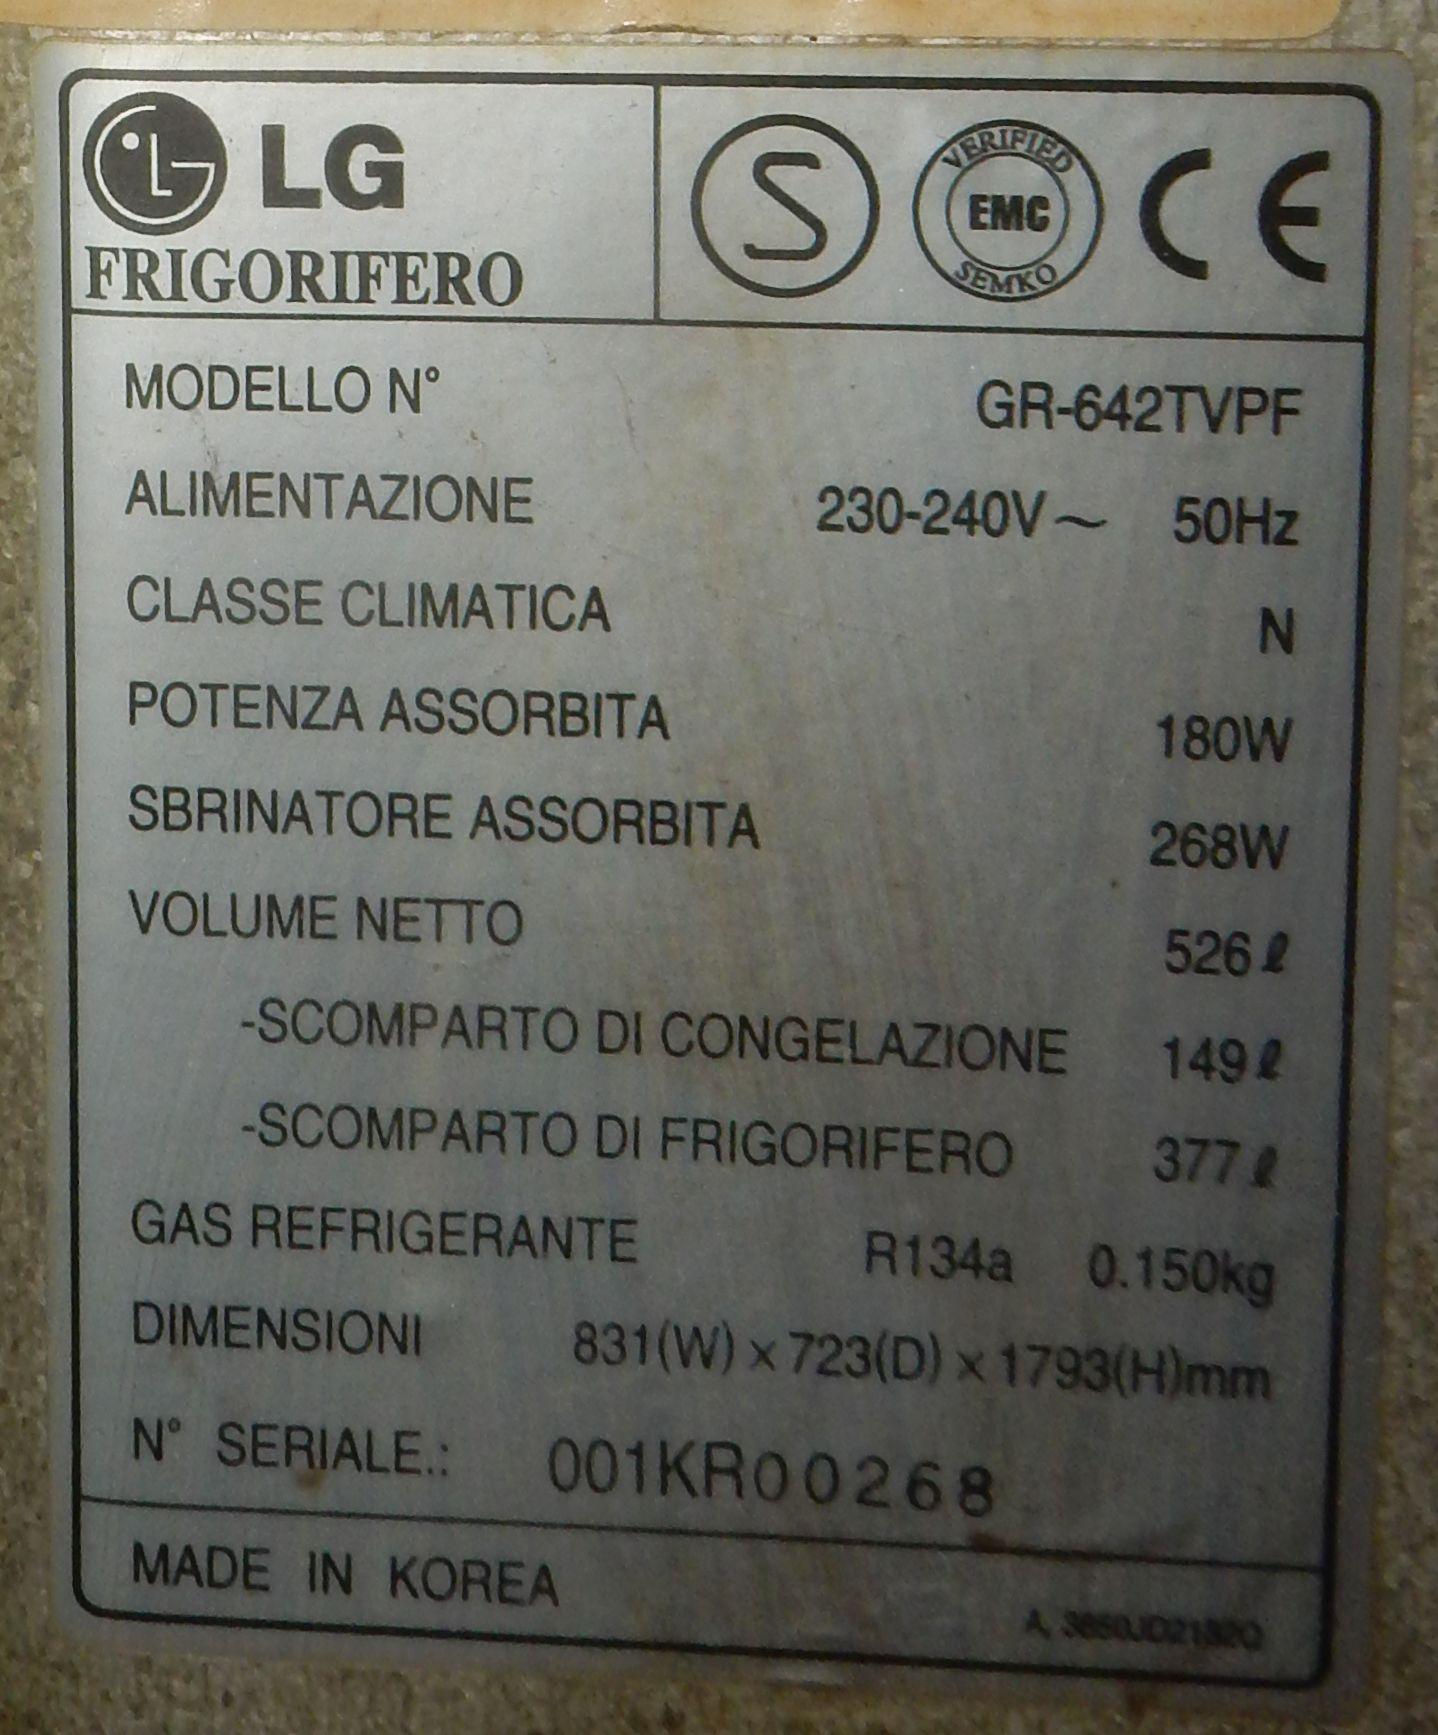 http://www.energialternativa.info/public/newforum/ForumEA/U/LG-GR-642TVPF-targhetta.jpg